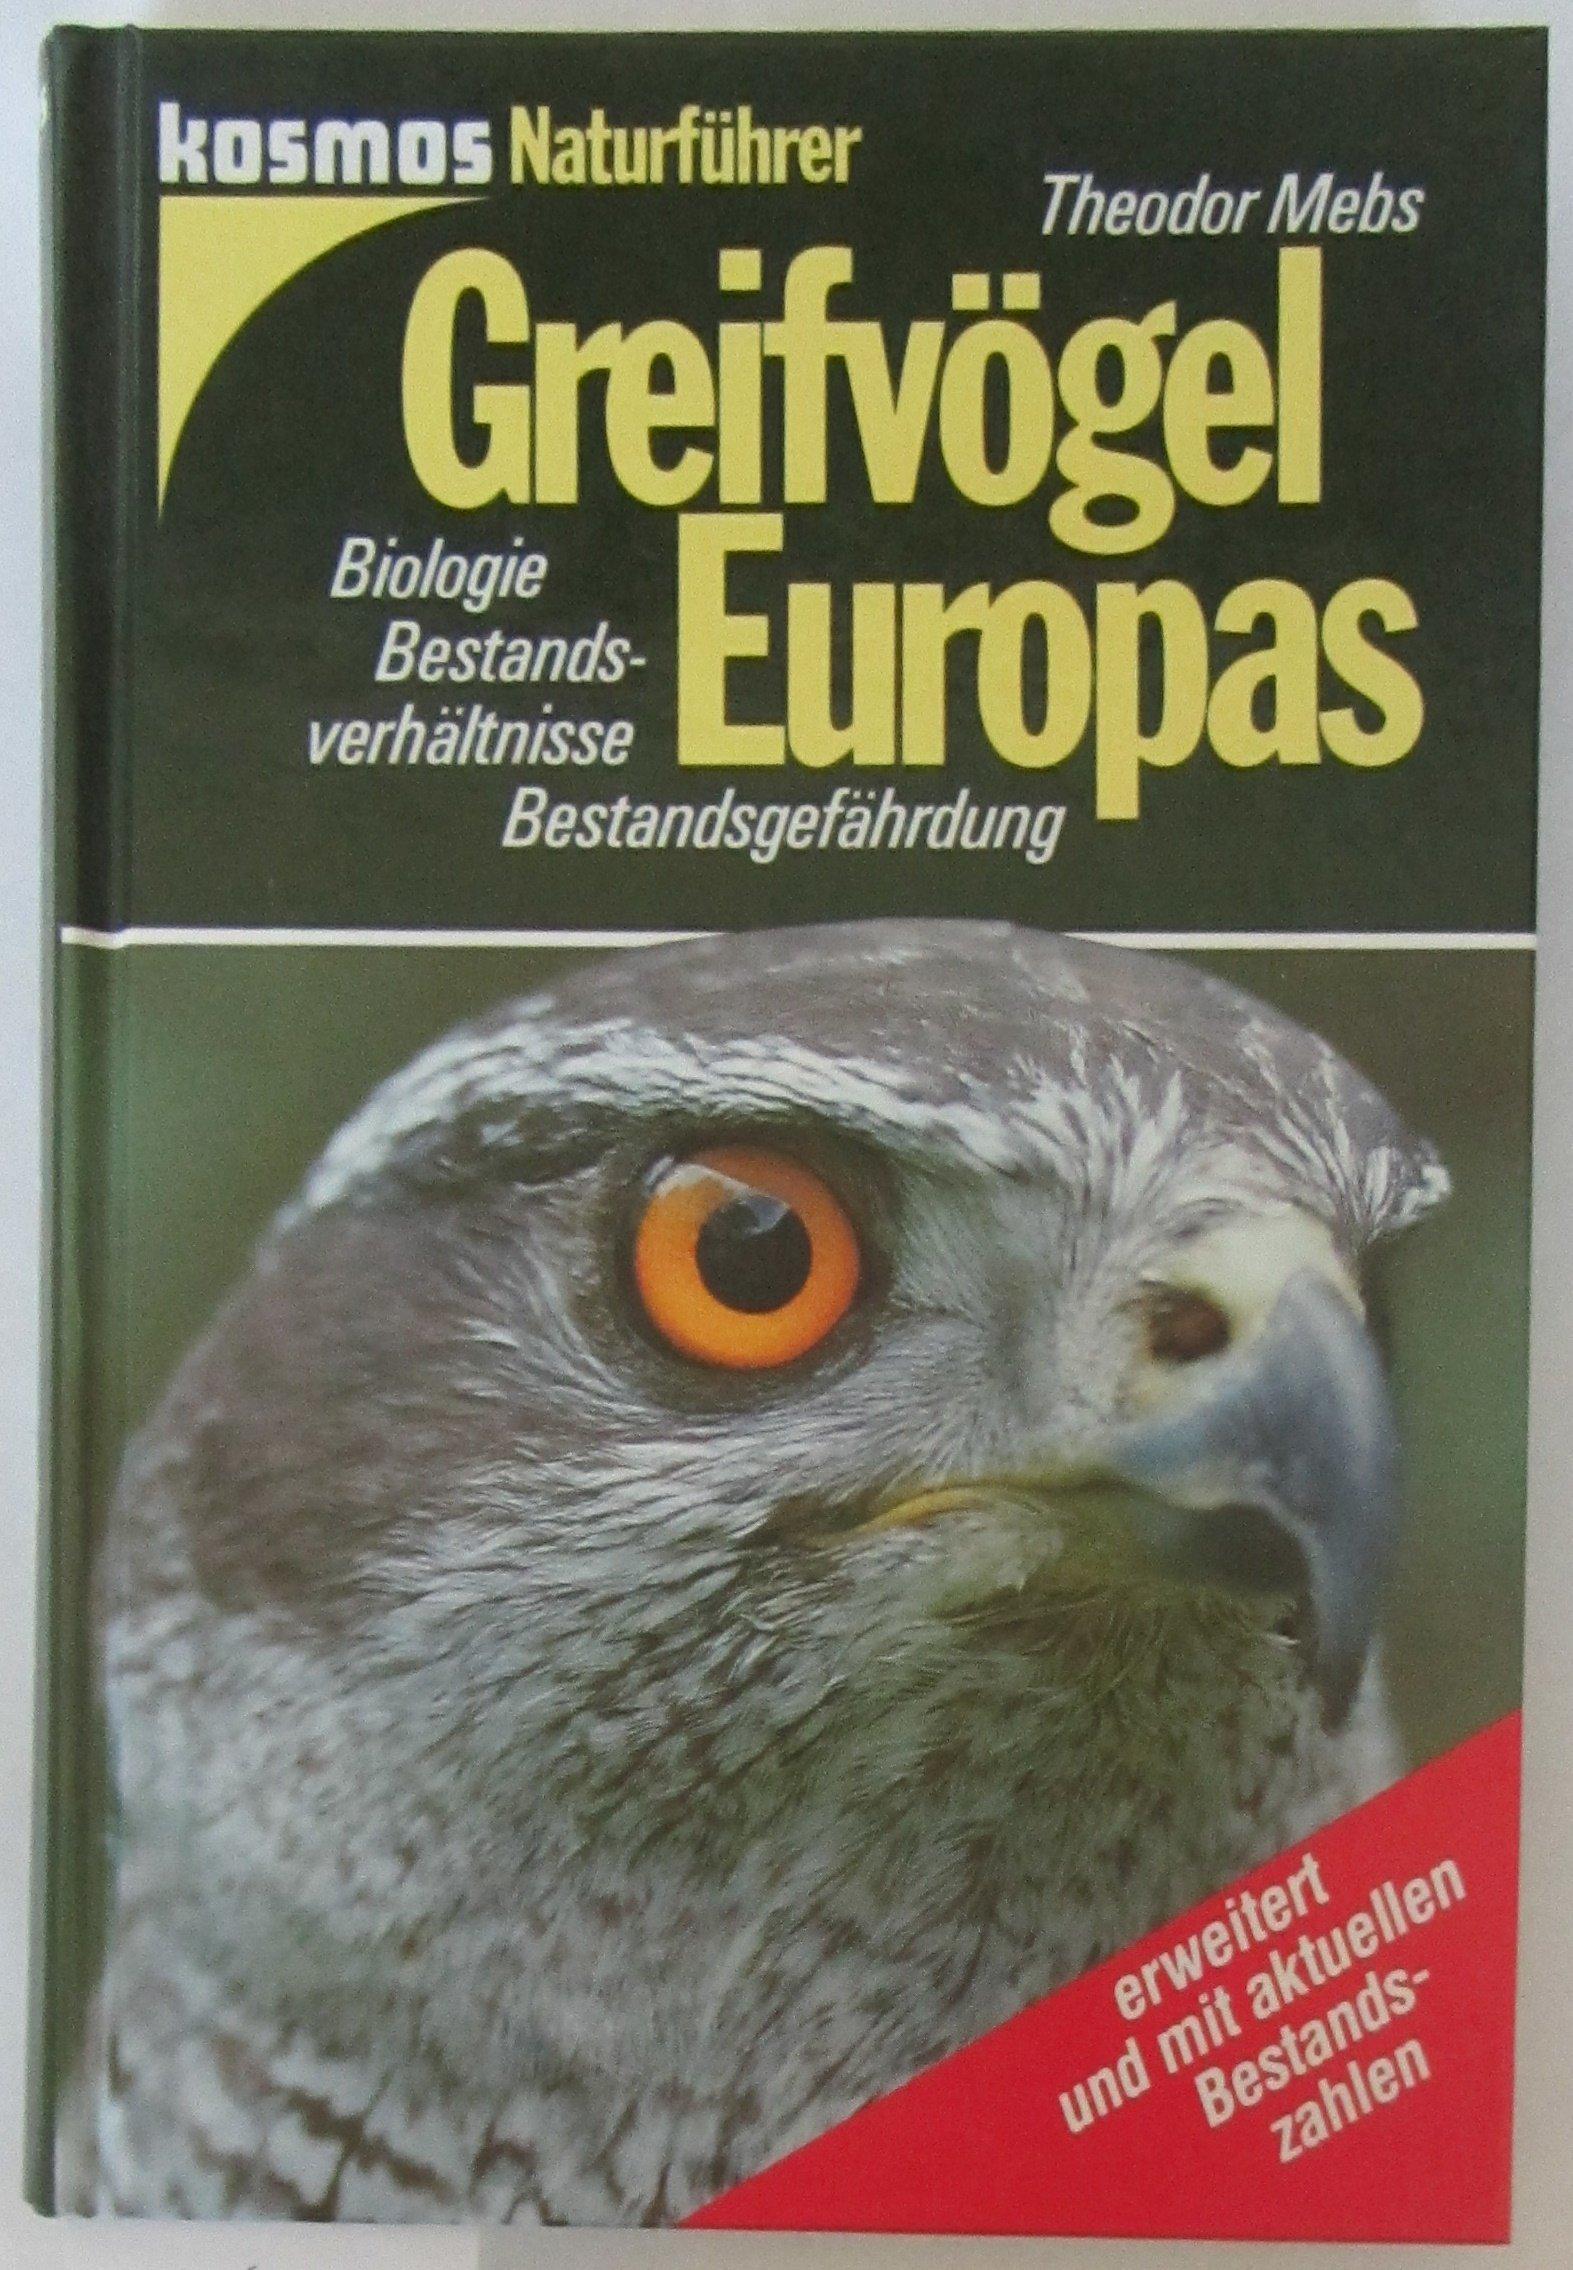 Greifvögel Europas. Biologie. Bestandsverhältnisse. Bestandsgefährdung